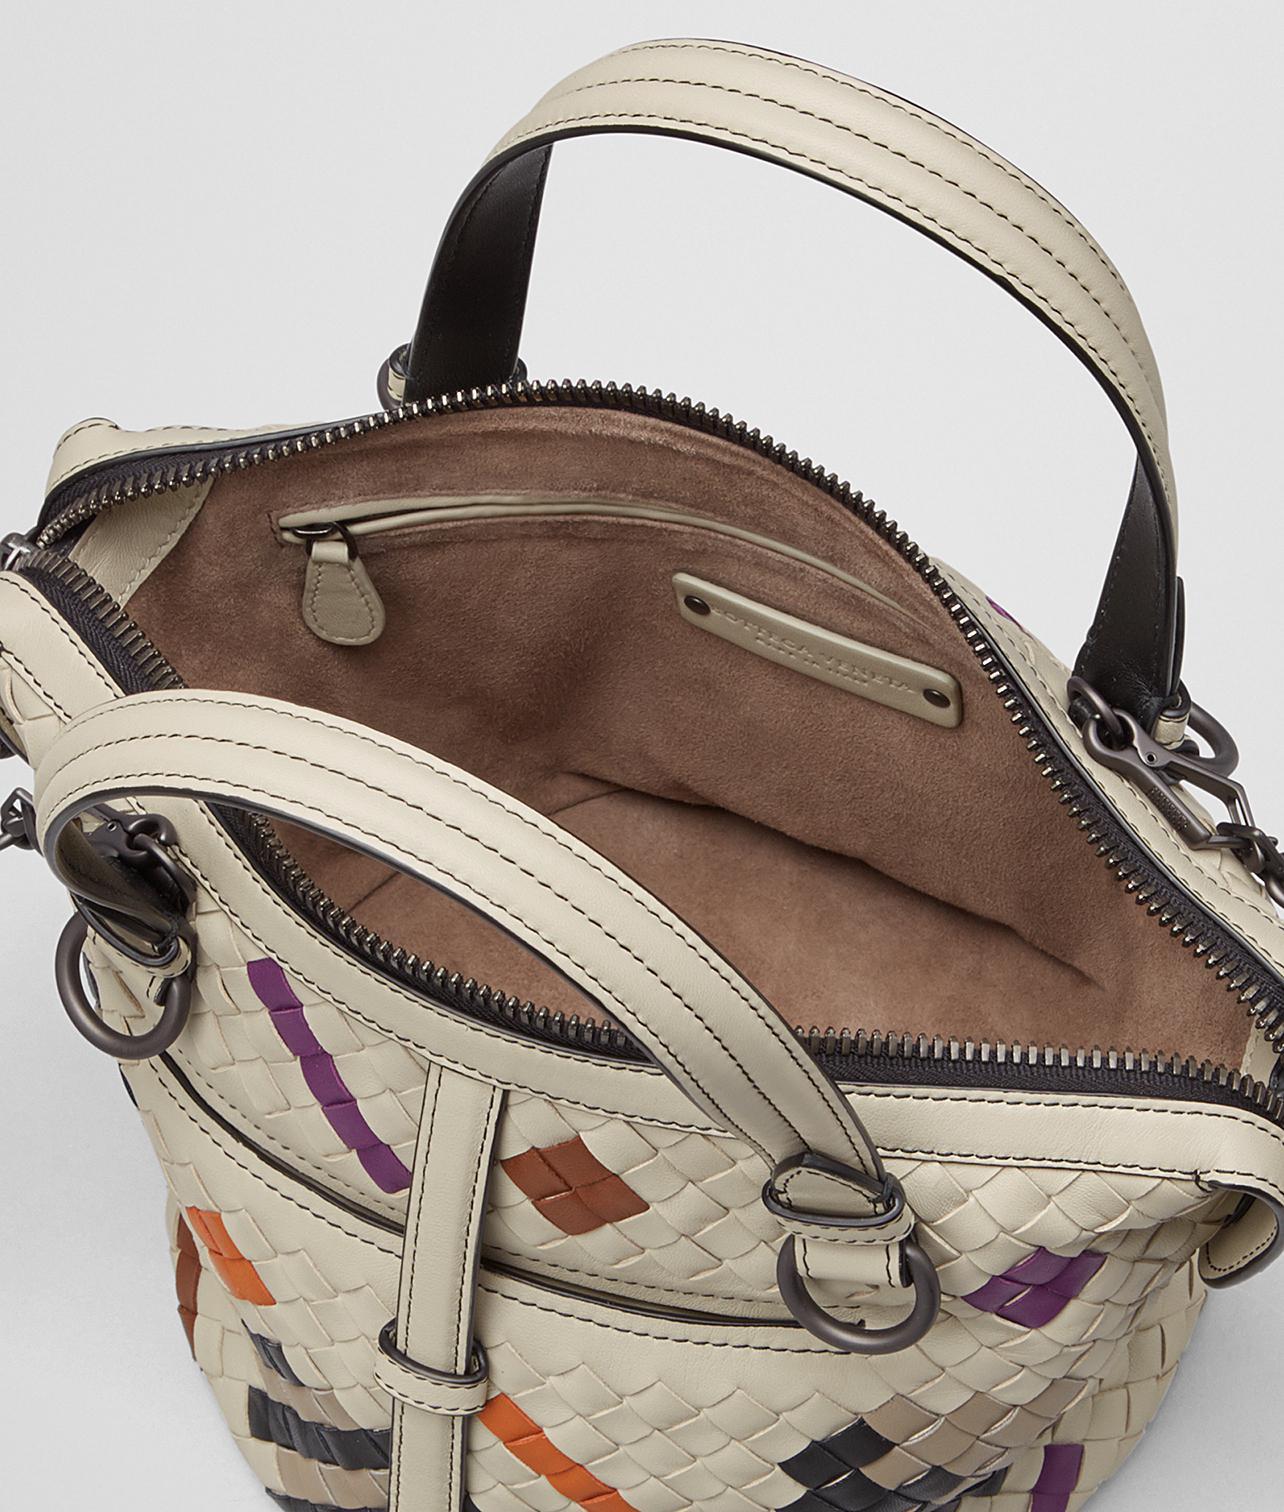 Lyst - Bottega Veneta Multicolor Nappa Intrecciato Abstract Tambura Bag 5773bc27ac3bc